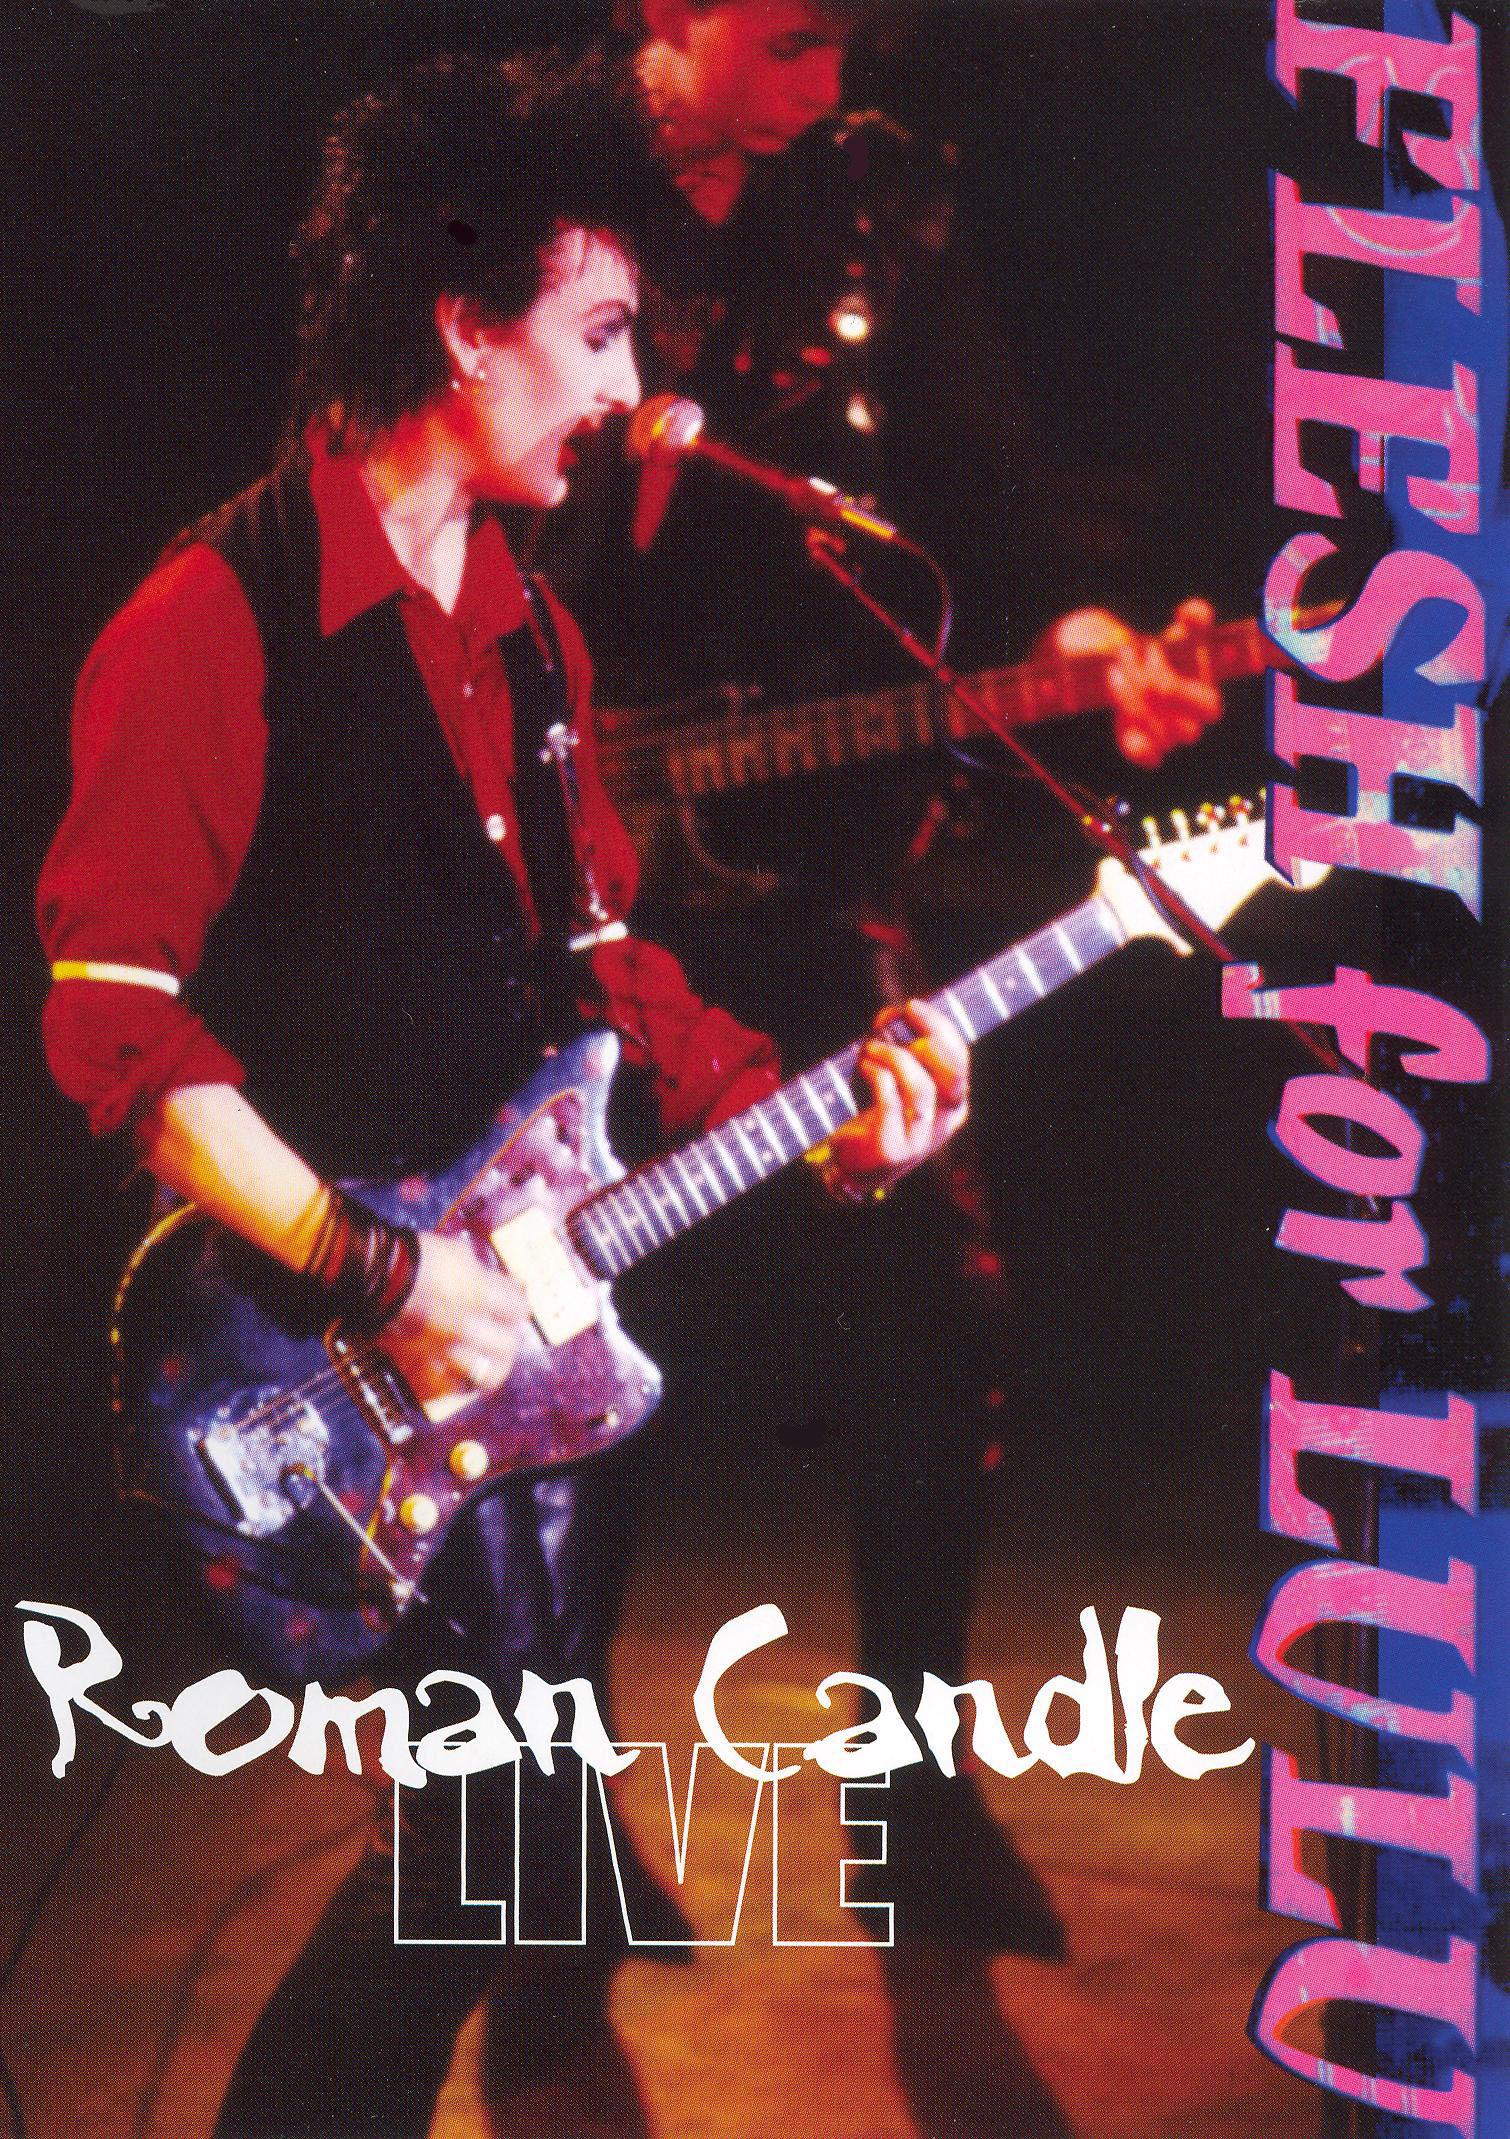 Flesh for Lulu: Roman Candle - Flesh for Lulu Live